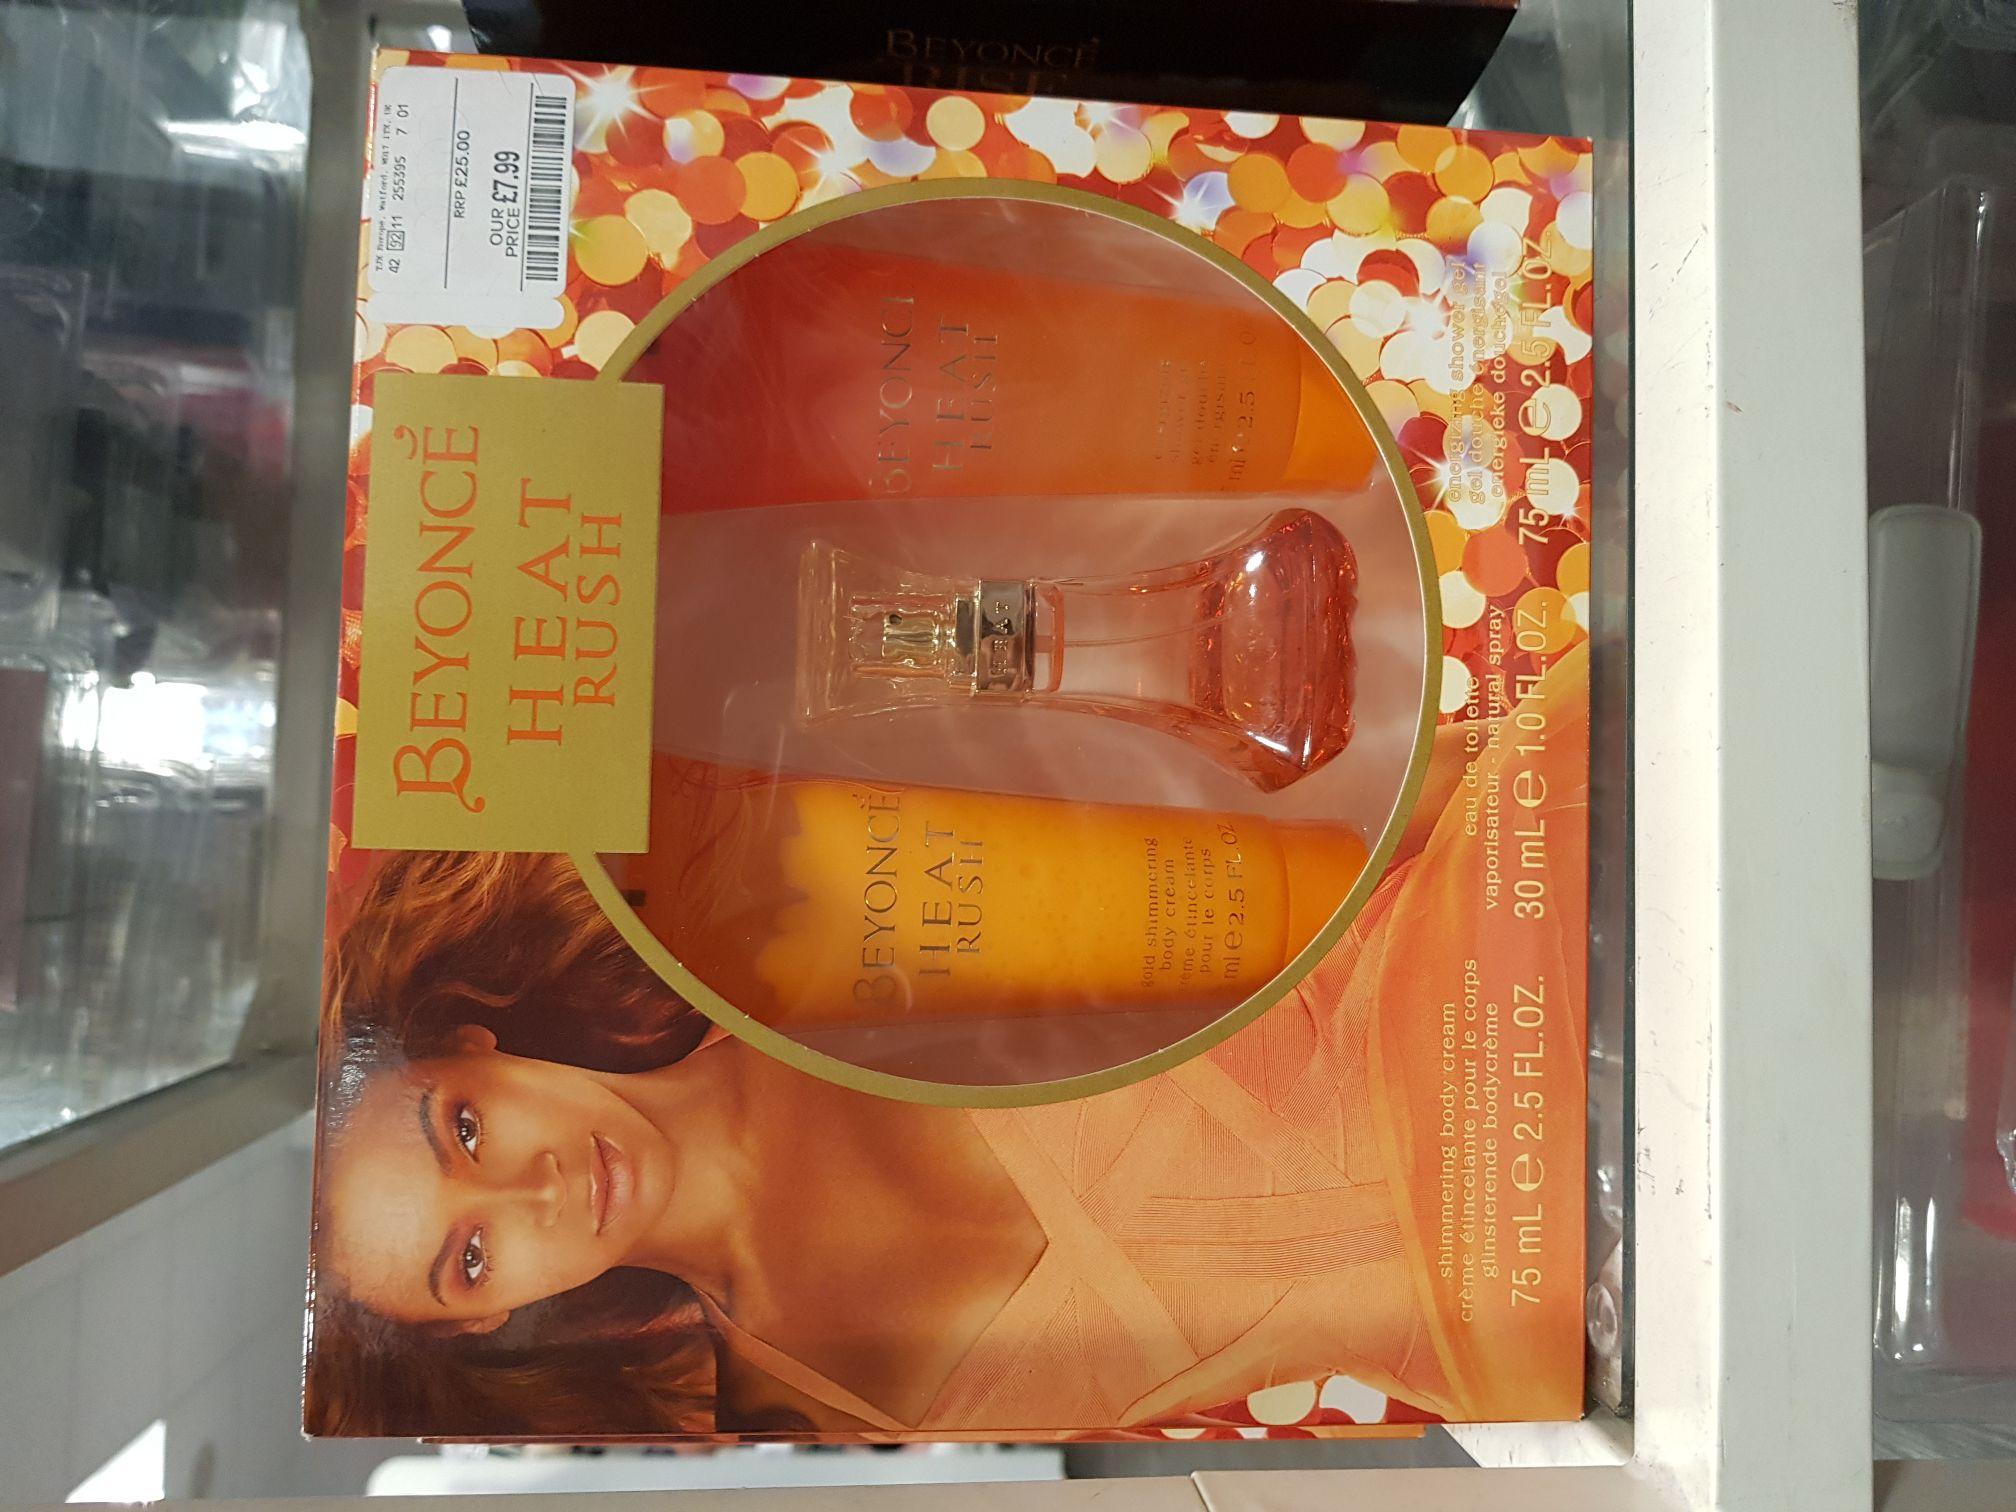 Beyonce heat. Gift pack £7.99TK Maxx - Gallions reach